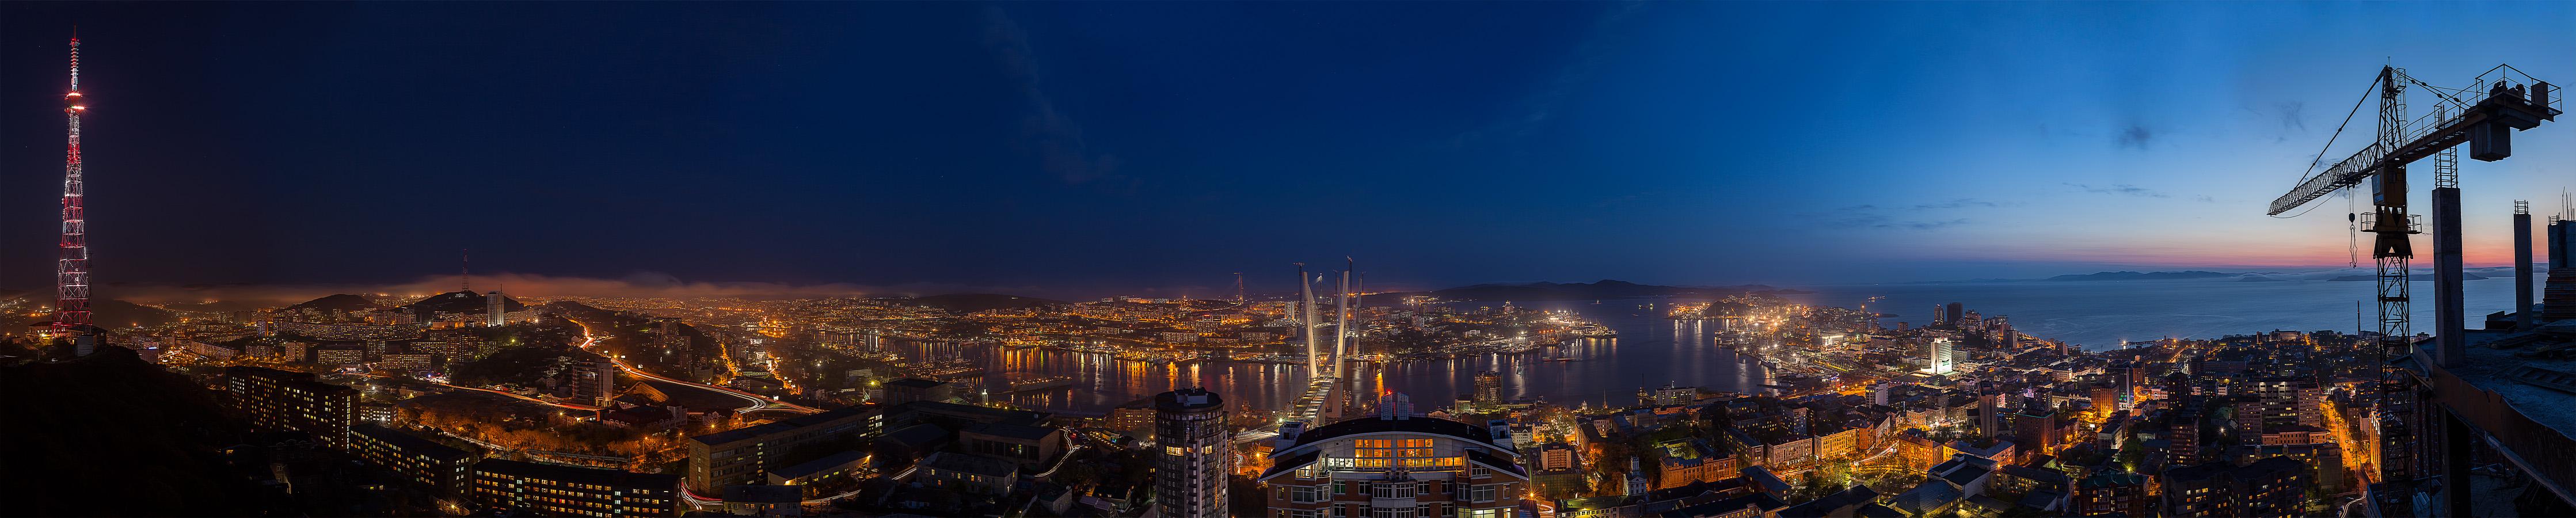 The Sound of Vladivostok